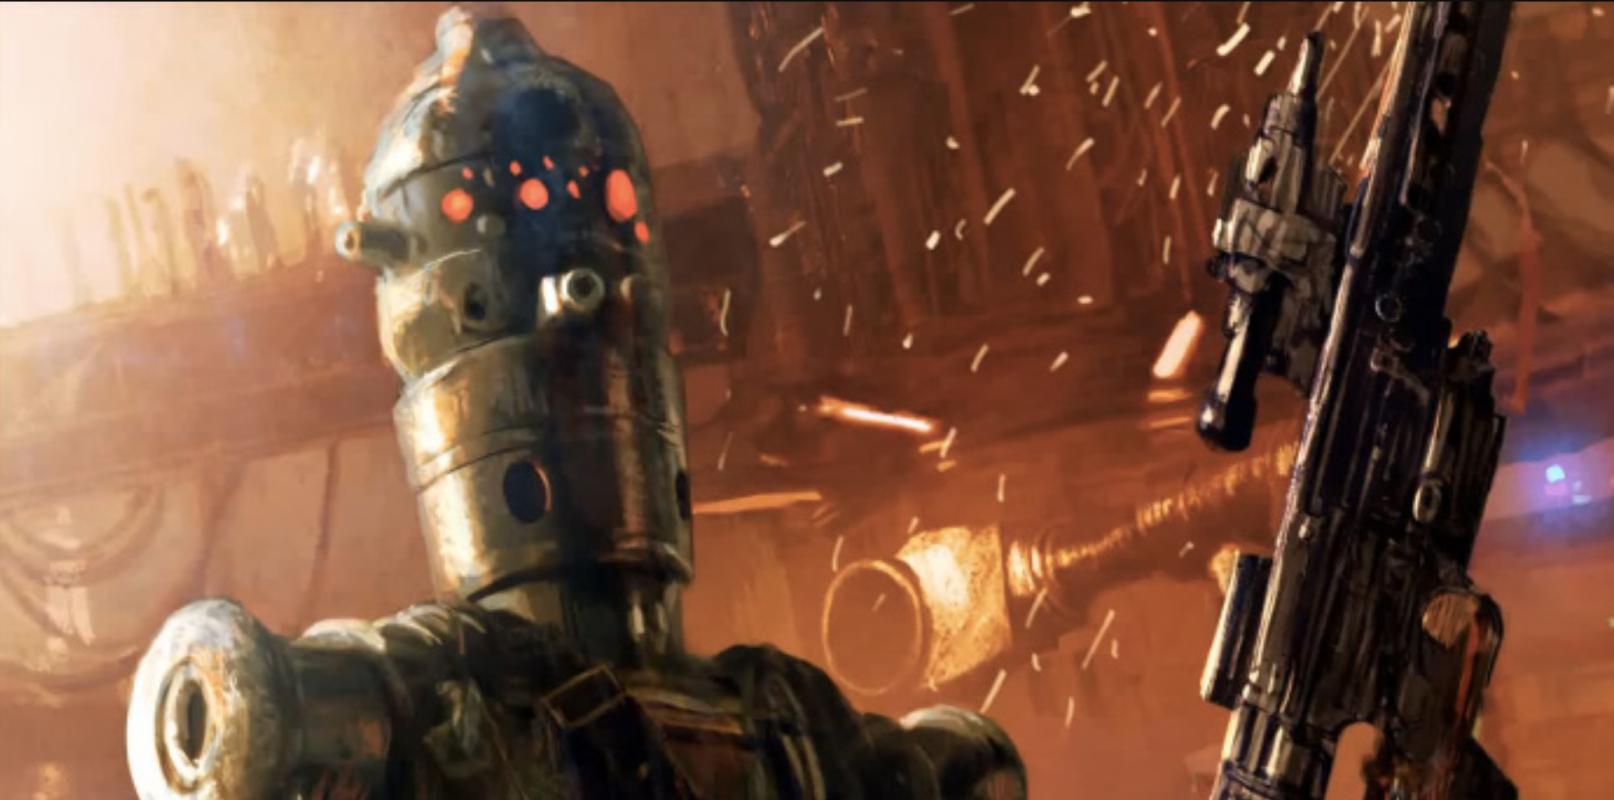 Jon Favreau conferma la presenza di IG-88 in The Mandalorian thumbnail